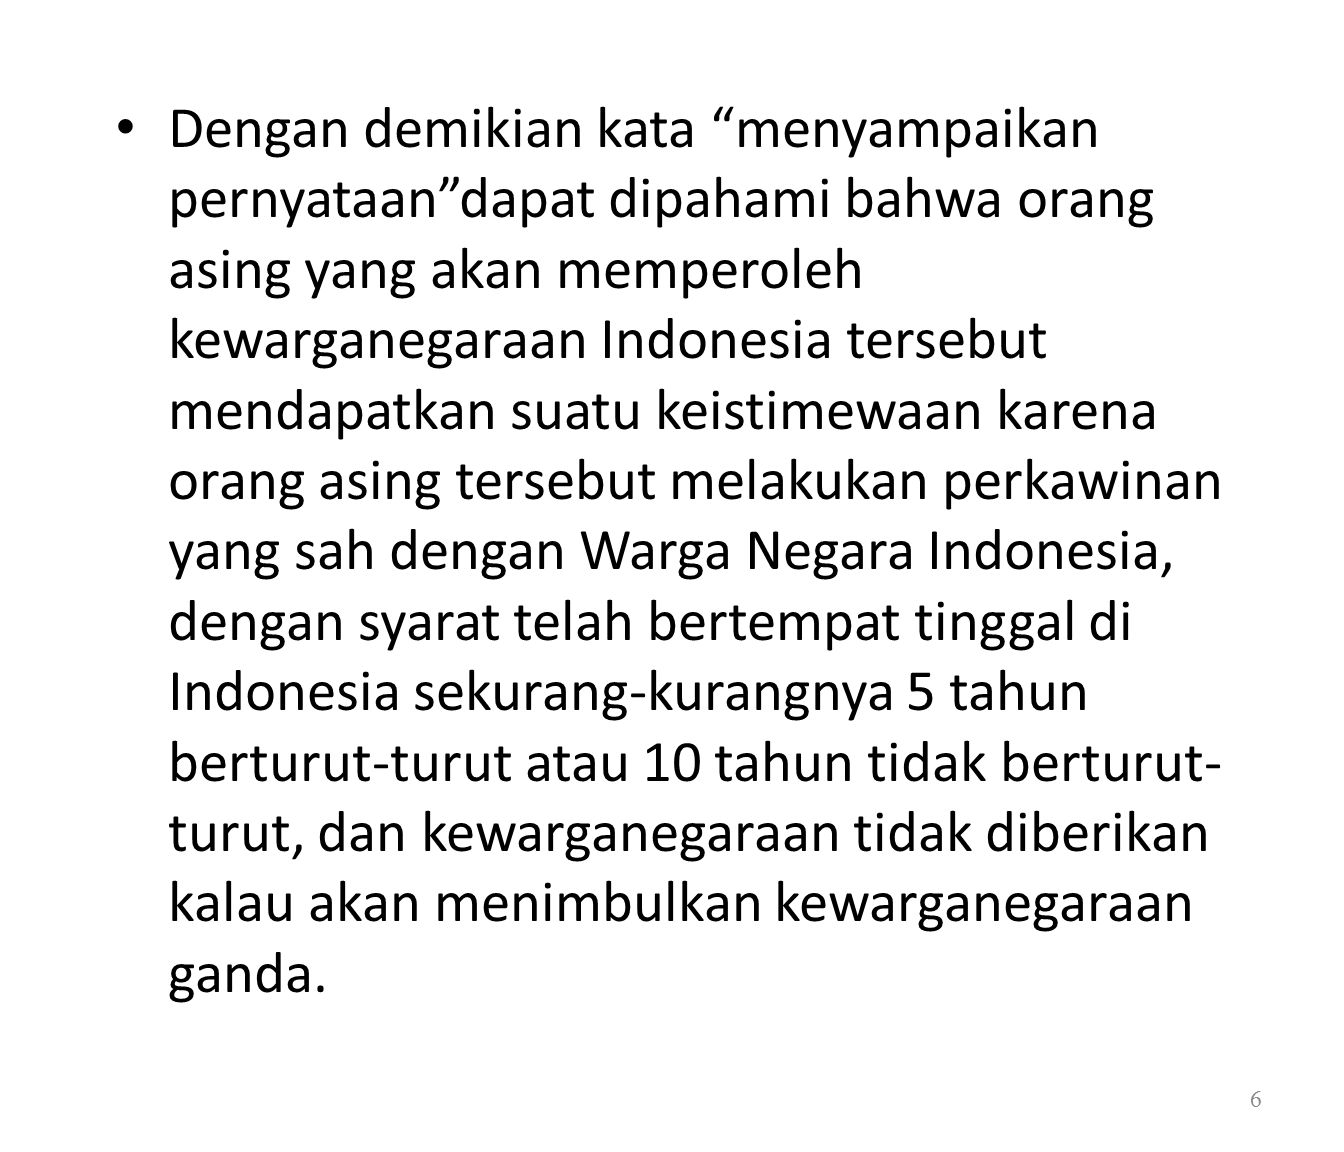 Dengan demikian kata menyampaikan pernyataan dapat dipahami bahwa orang asing yang akan memperoleh kewarganegaraan Indonesia tersebut mendapatkan suatu keistimewaan karena orang asing tersebut melakukan perkawinan yang sah dengan Warga Negara Indonesia, dengan syarat telah bertempat tinggal di Indonesia sekurang-kurangnya 5 tahun berturut-turut atau 10 tahun tidak berturut- turut, dan kewarganegaraan tidak diberikan kalau akan menimbulkan kewarganegaraan ganda.